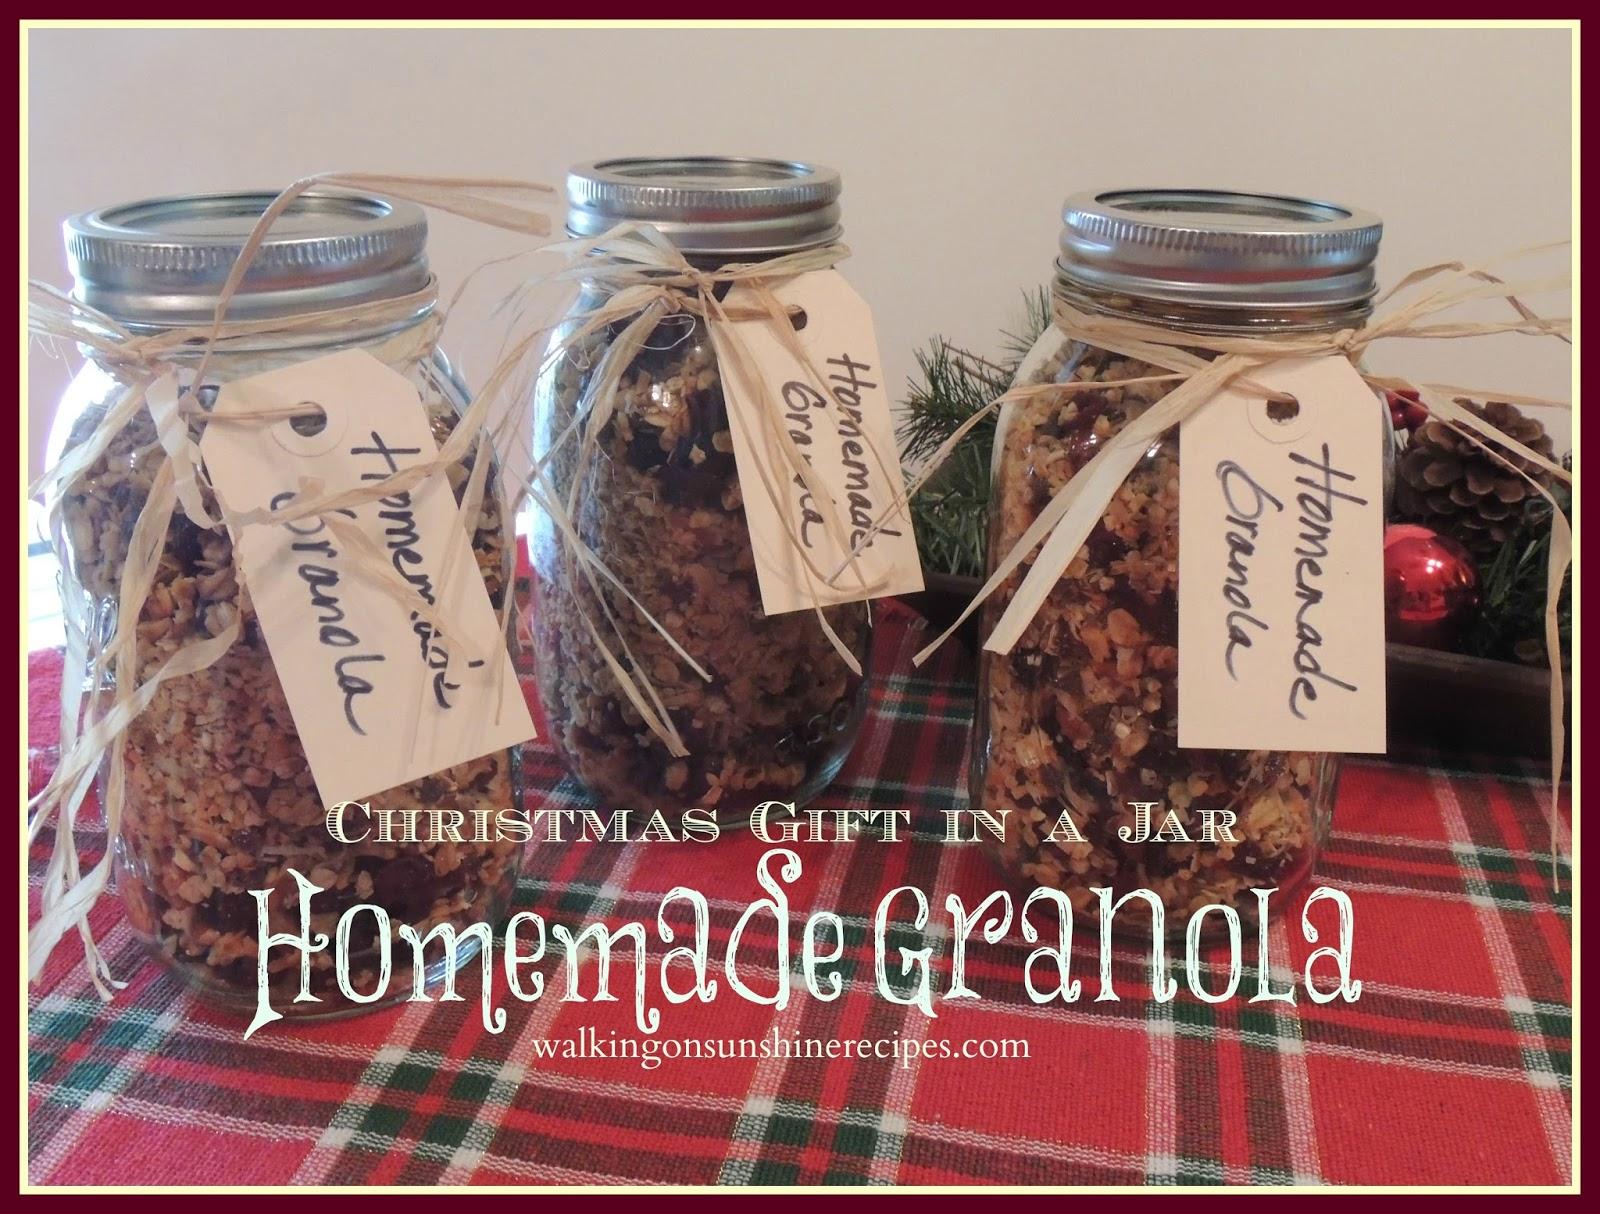 Christmas Gift in a Jar Homemade Granola / Walking on Sunshine Recipes